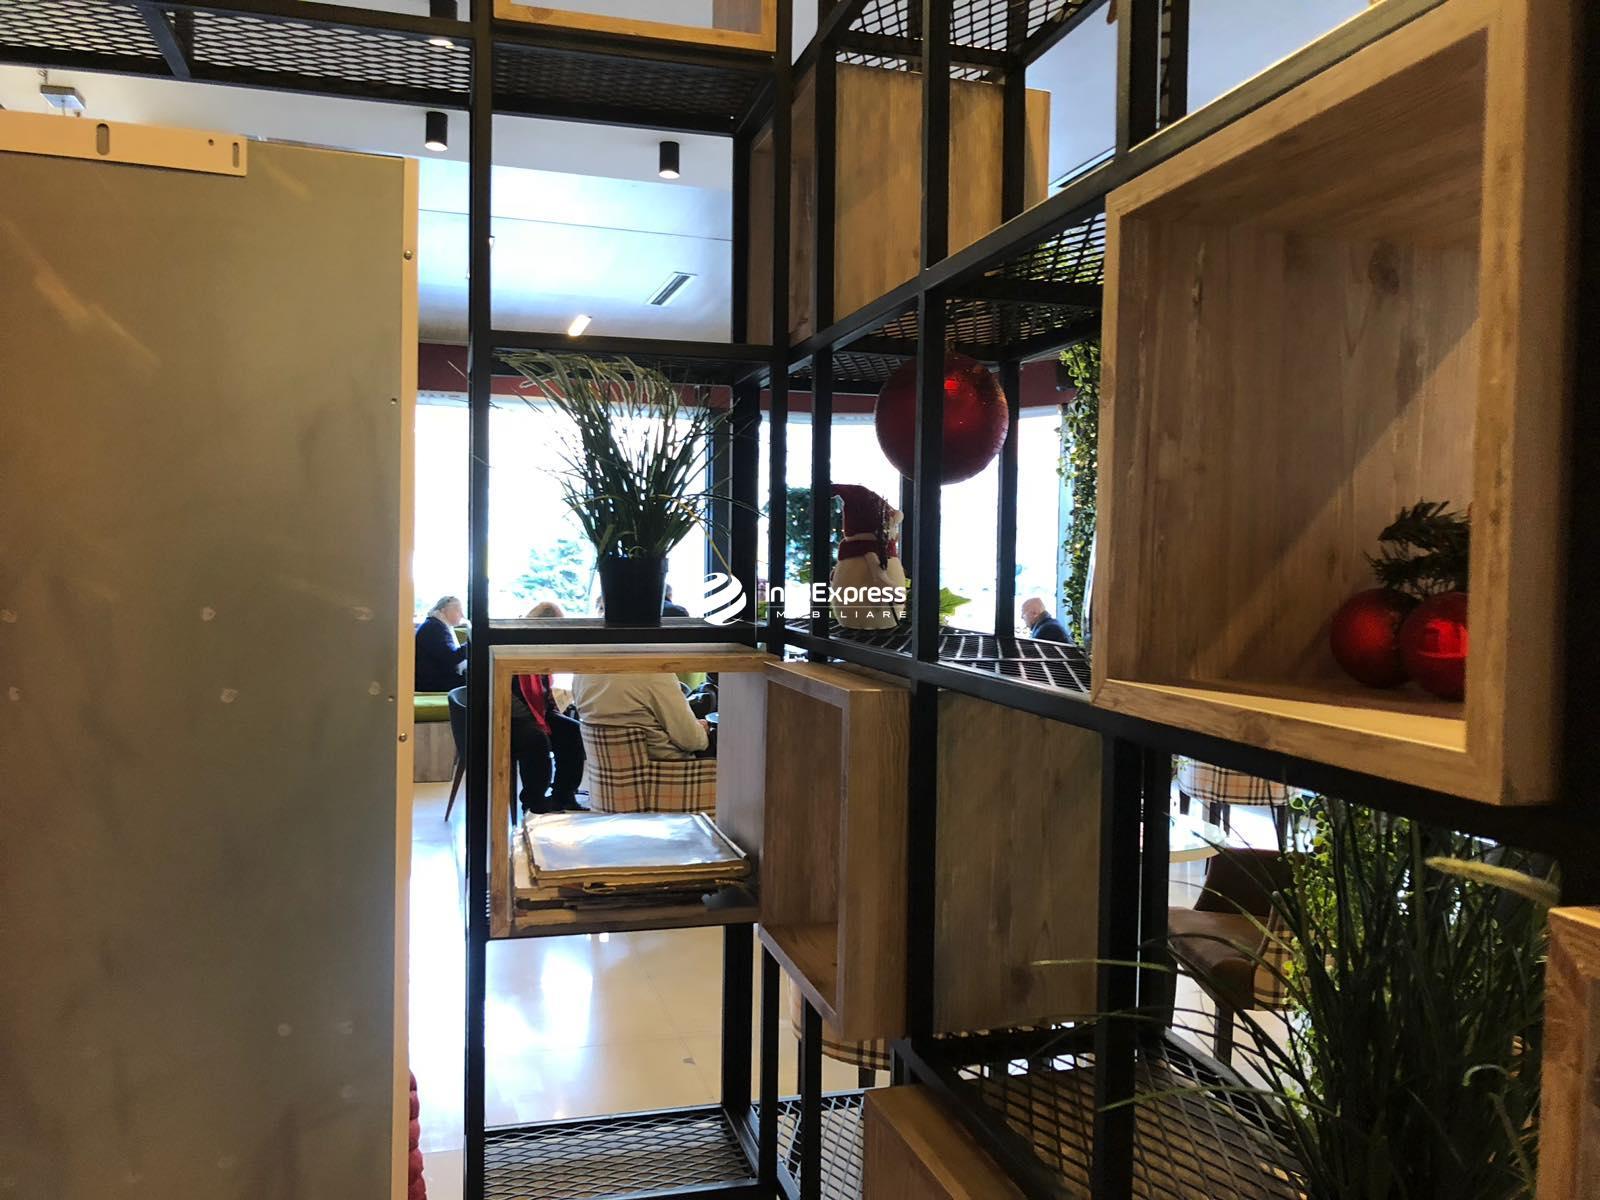 TRR-0419-1570 Jepet me qera bar-cafe ndodhet ne bulevardin Barjam Curri!